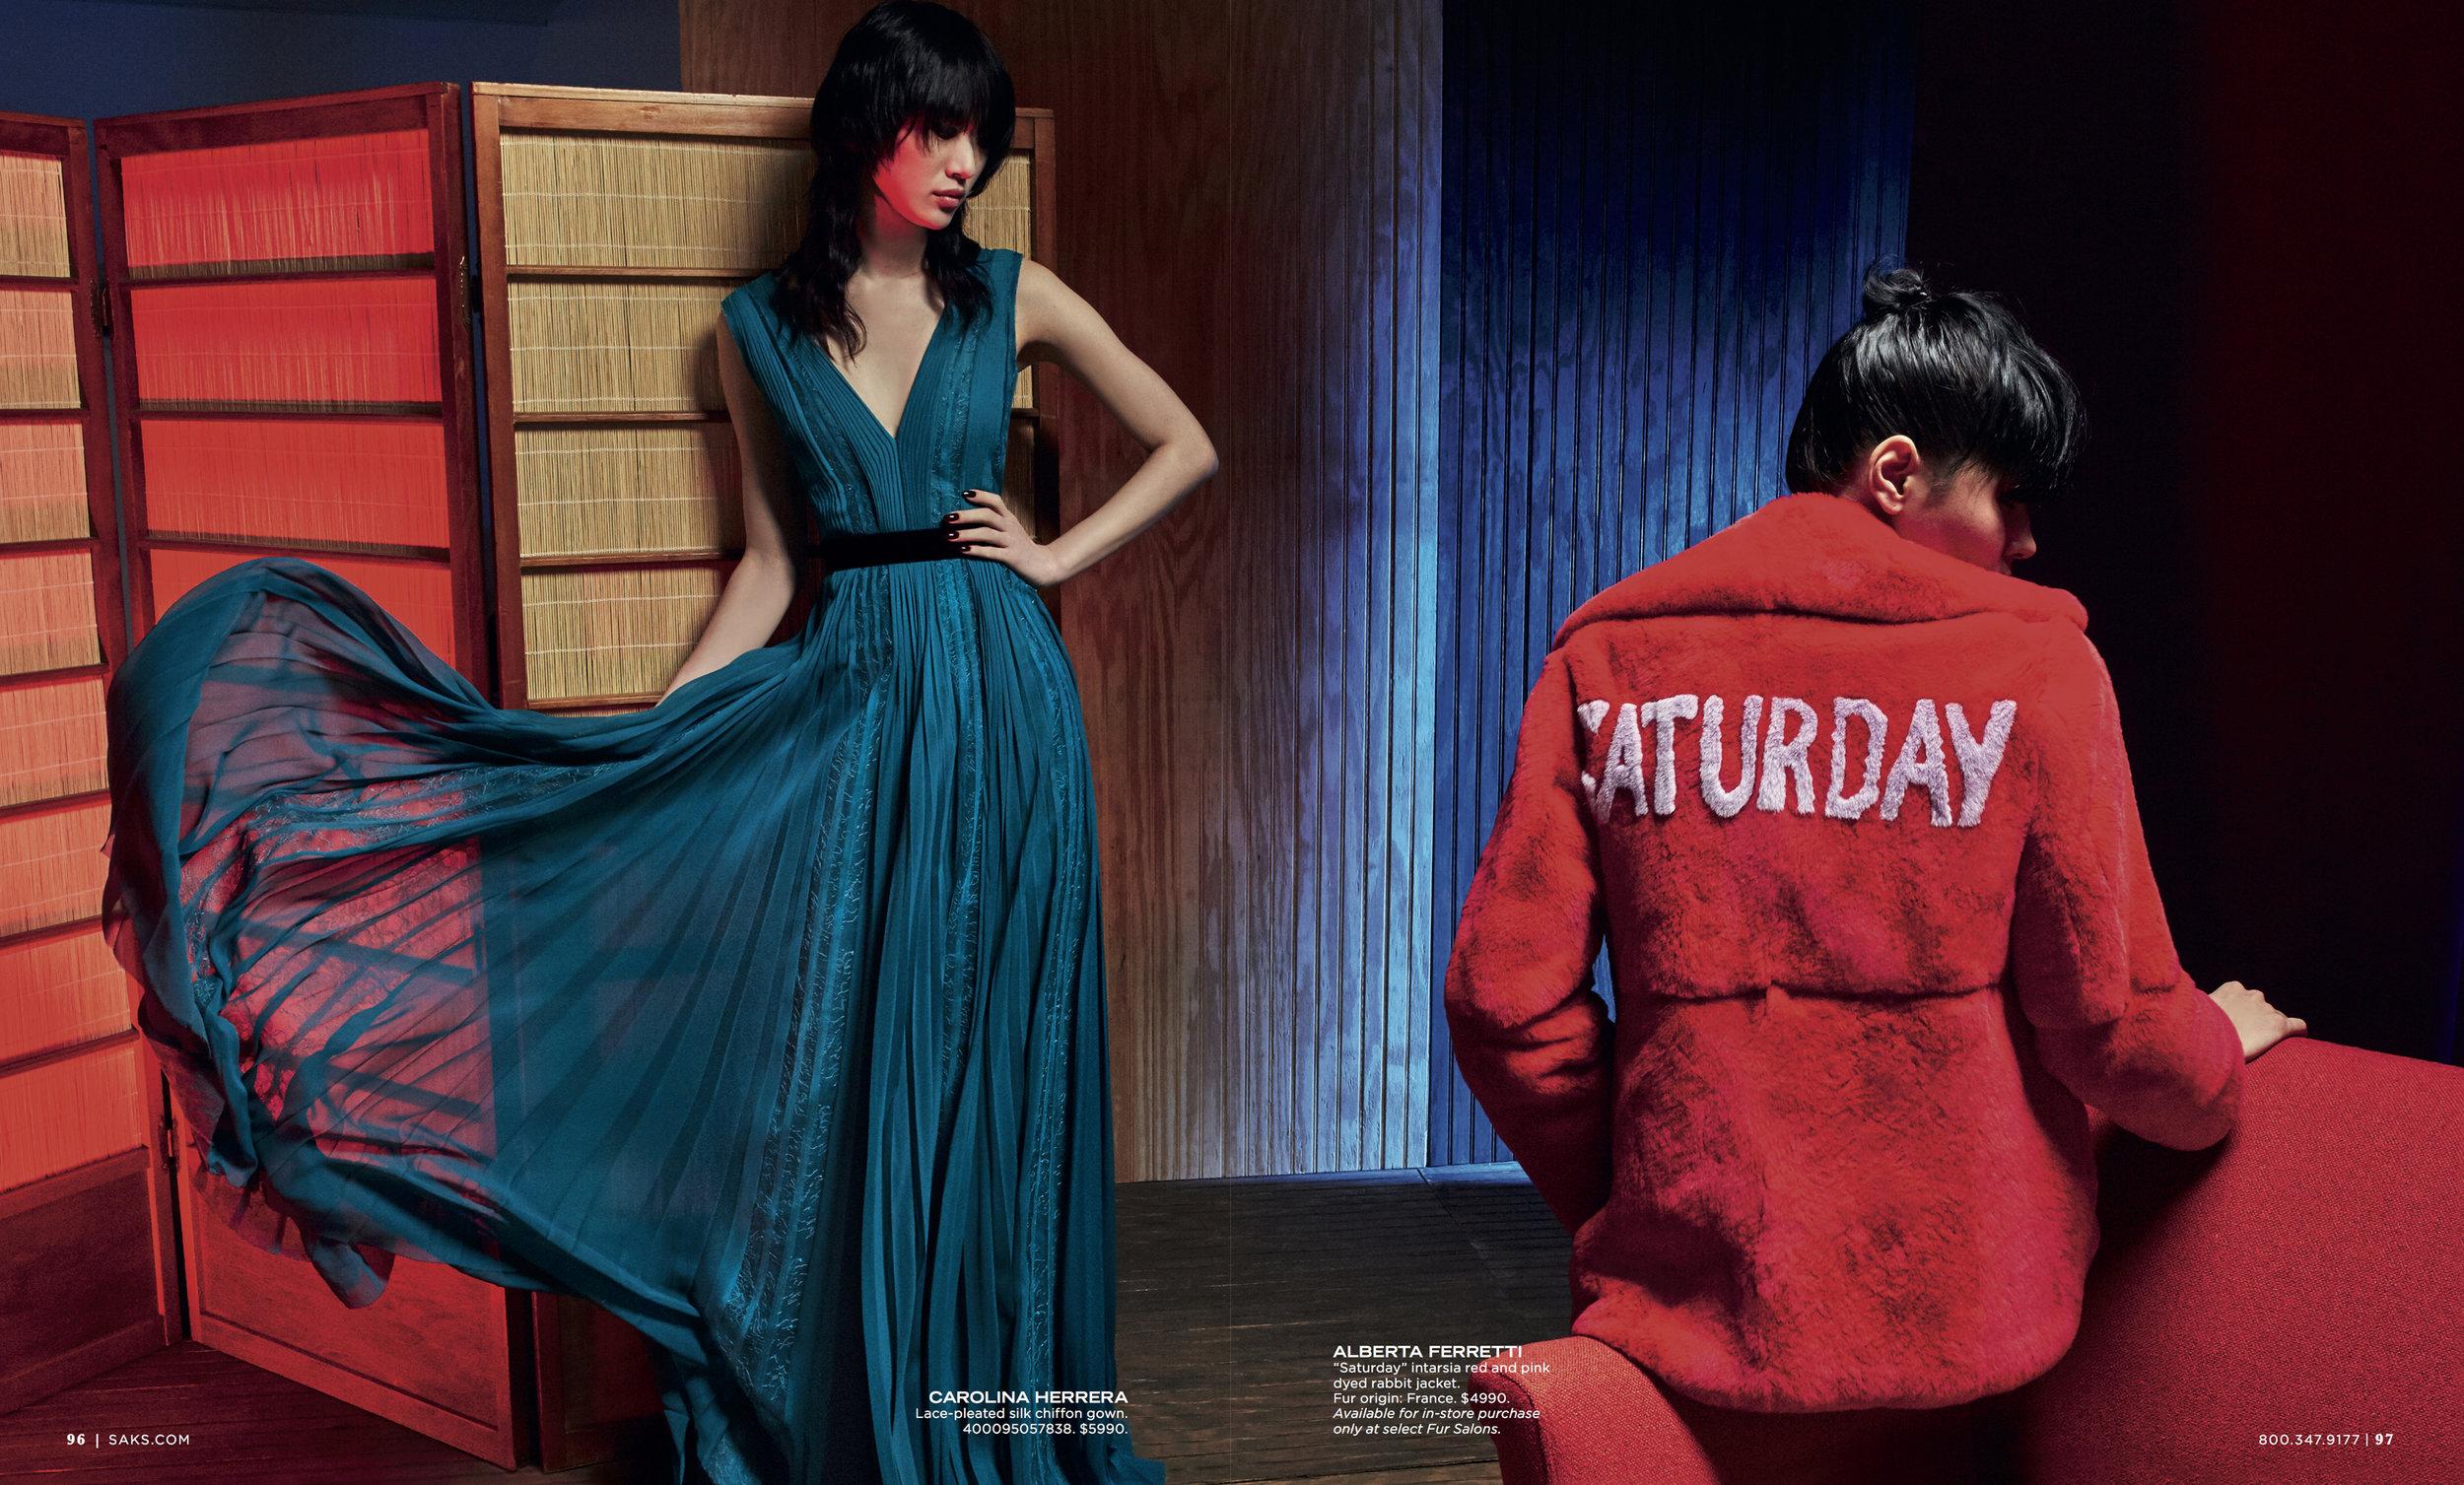 9015_SAKS_Fall Fashion_WOMAN_2017_spreads 49 copyS.jpg